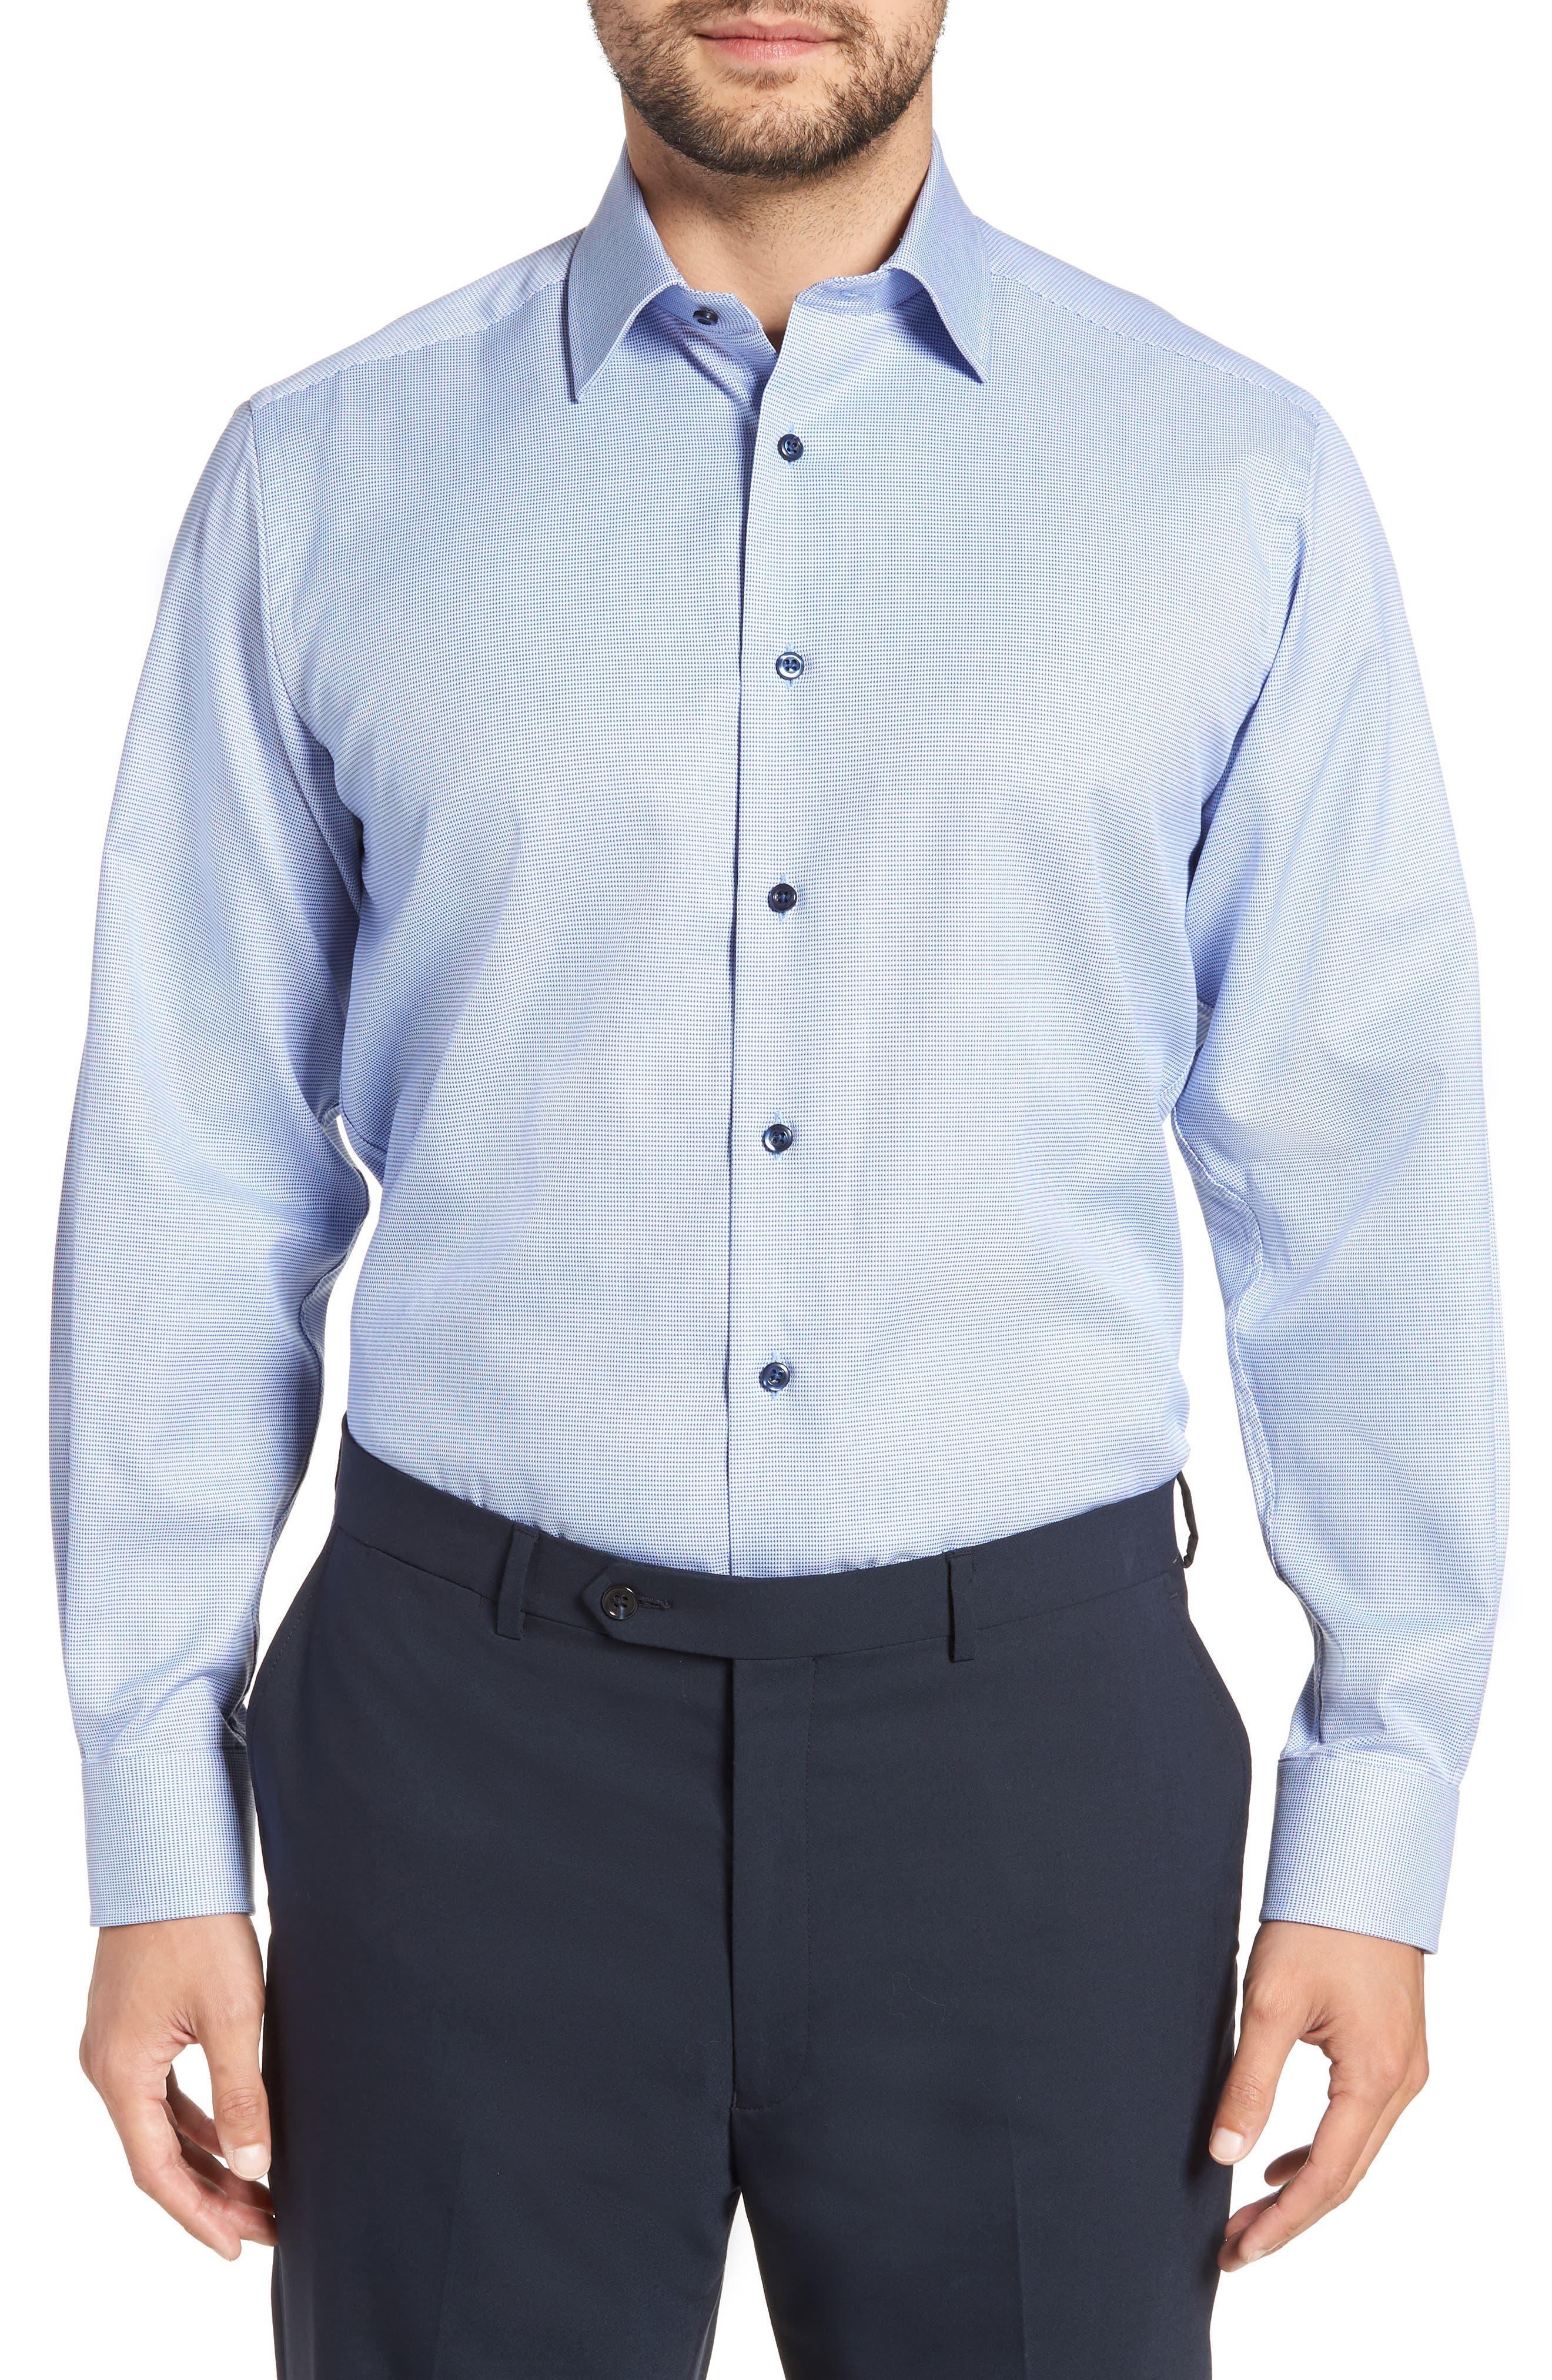 Regular Fit Solid Dress Shirt,                         Main,                         color, BLUE